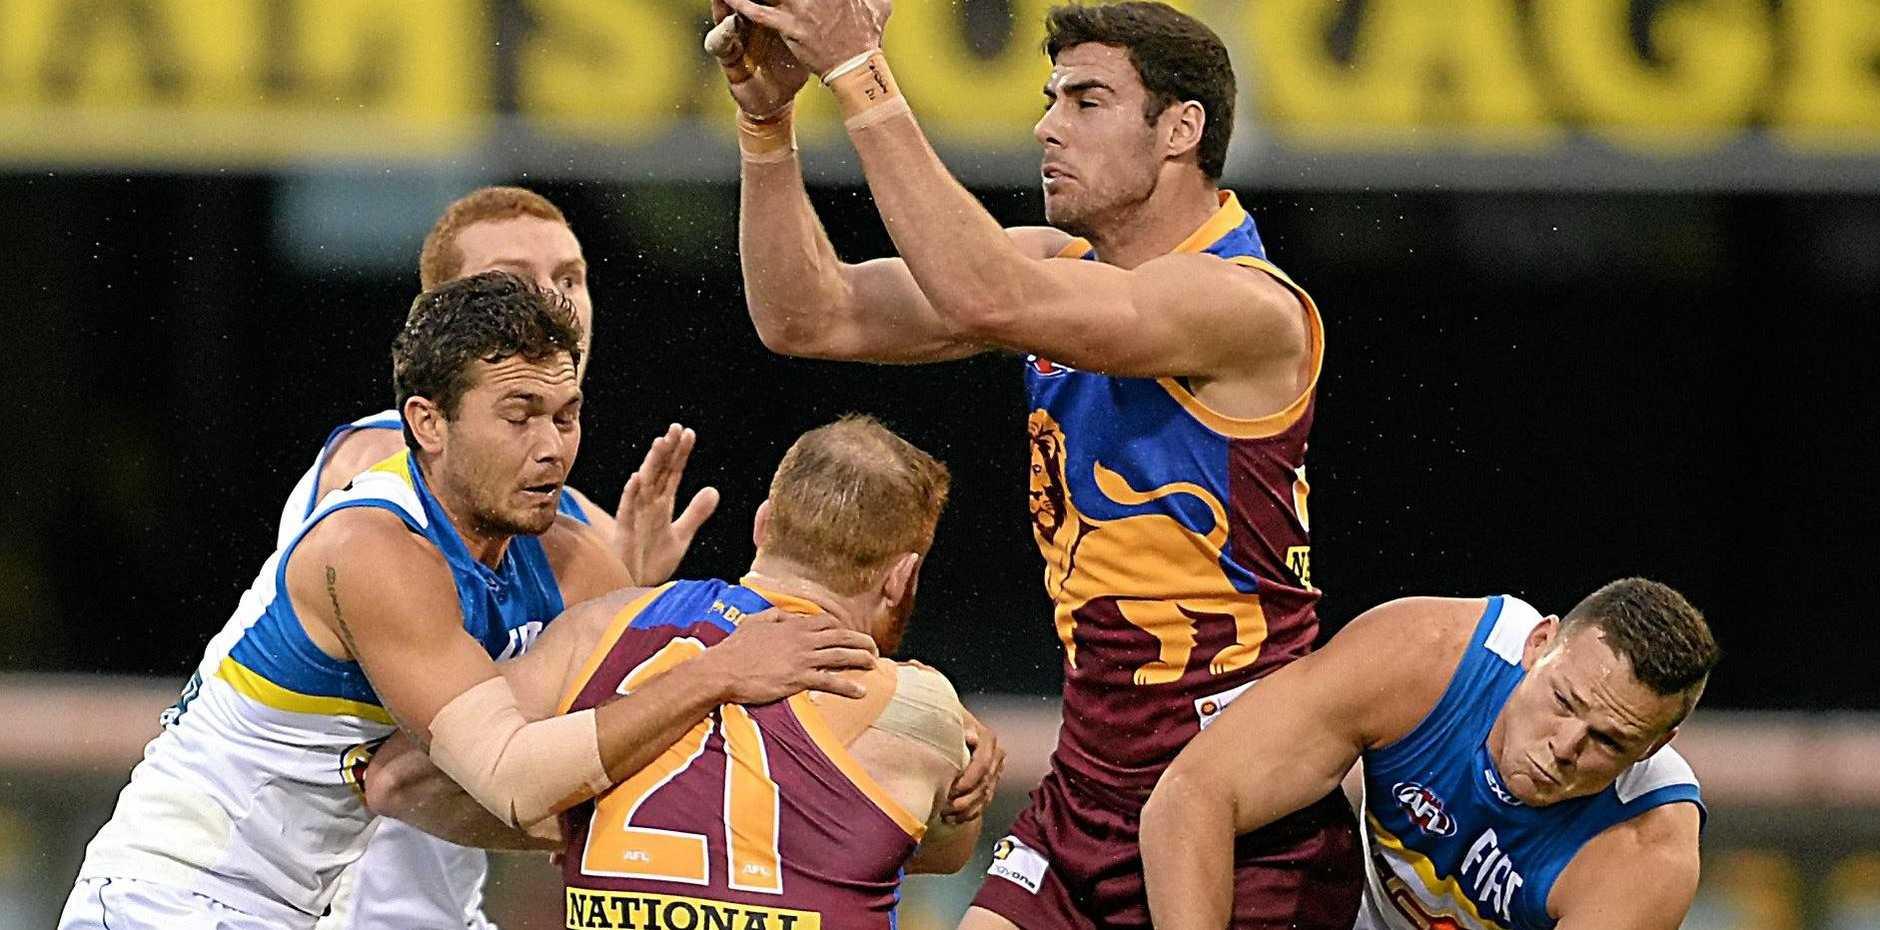 Michael Close of Brisbane Lions takes a mark.